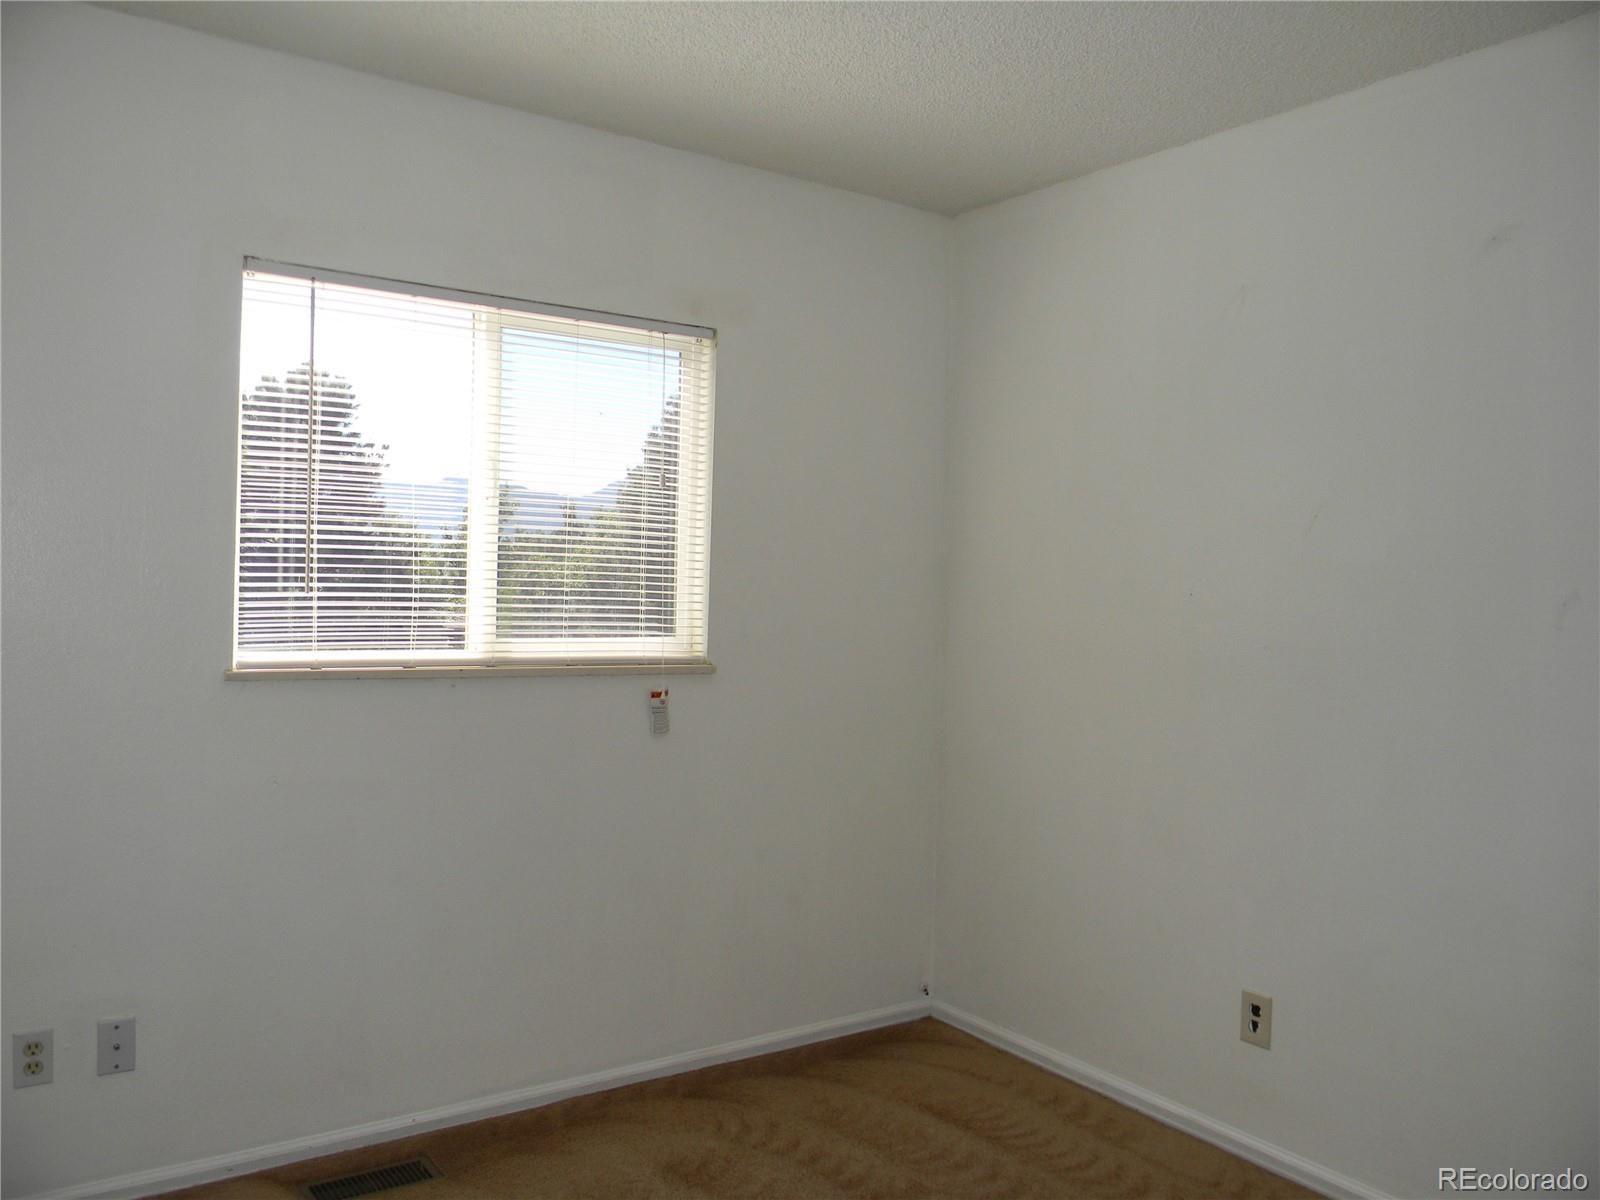 MLS# 5946356 - 15 - 4920 Ridenour Drive, Colorado Springs, CO 80916